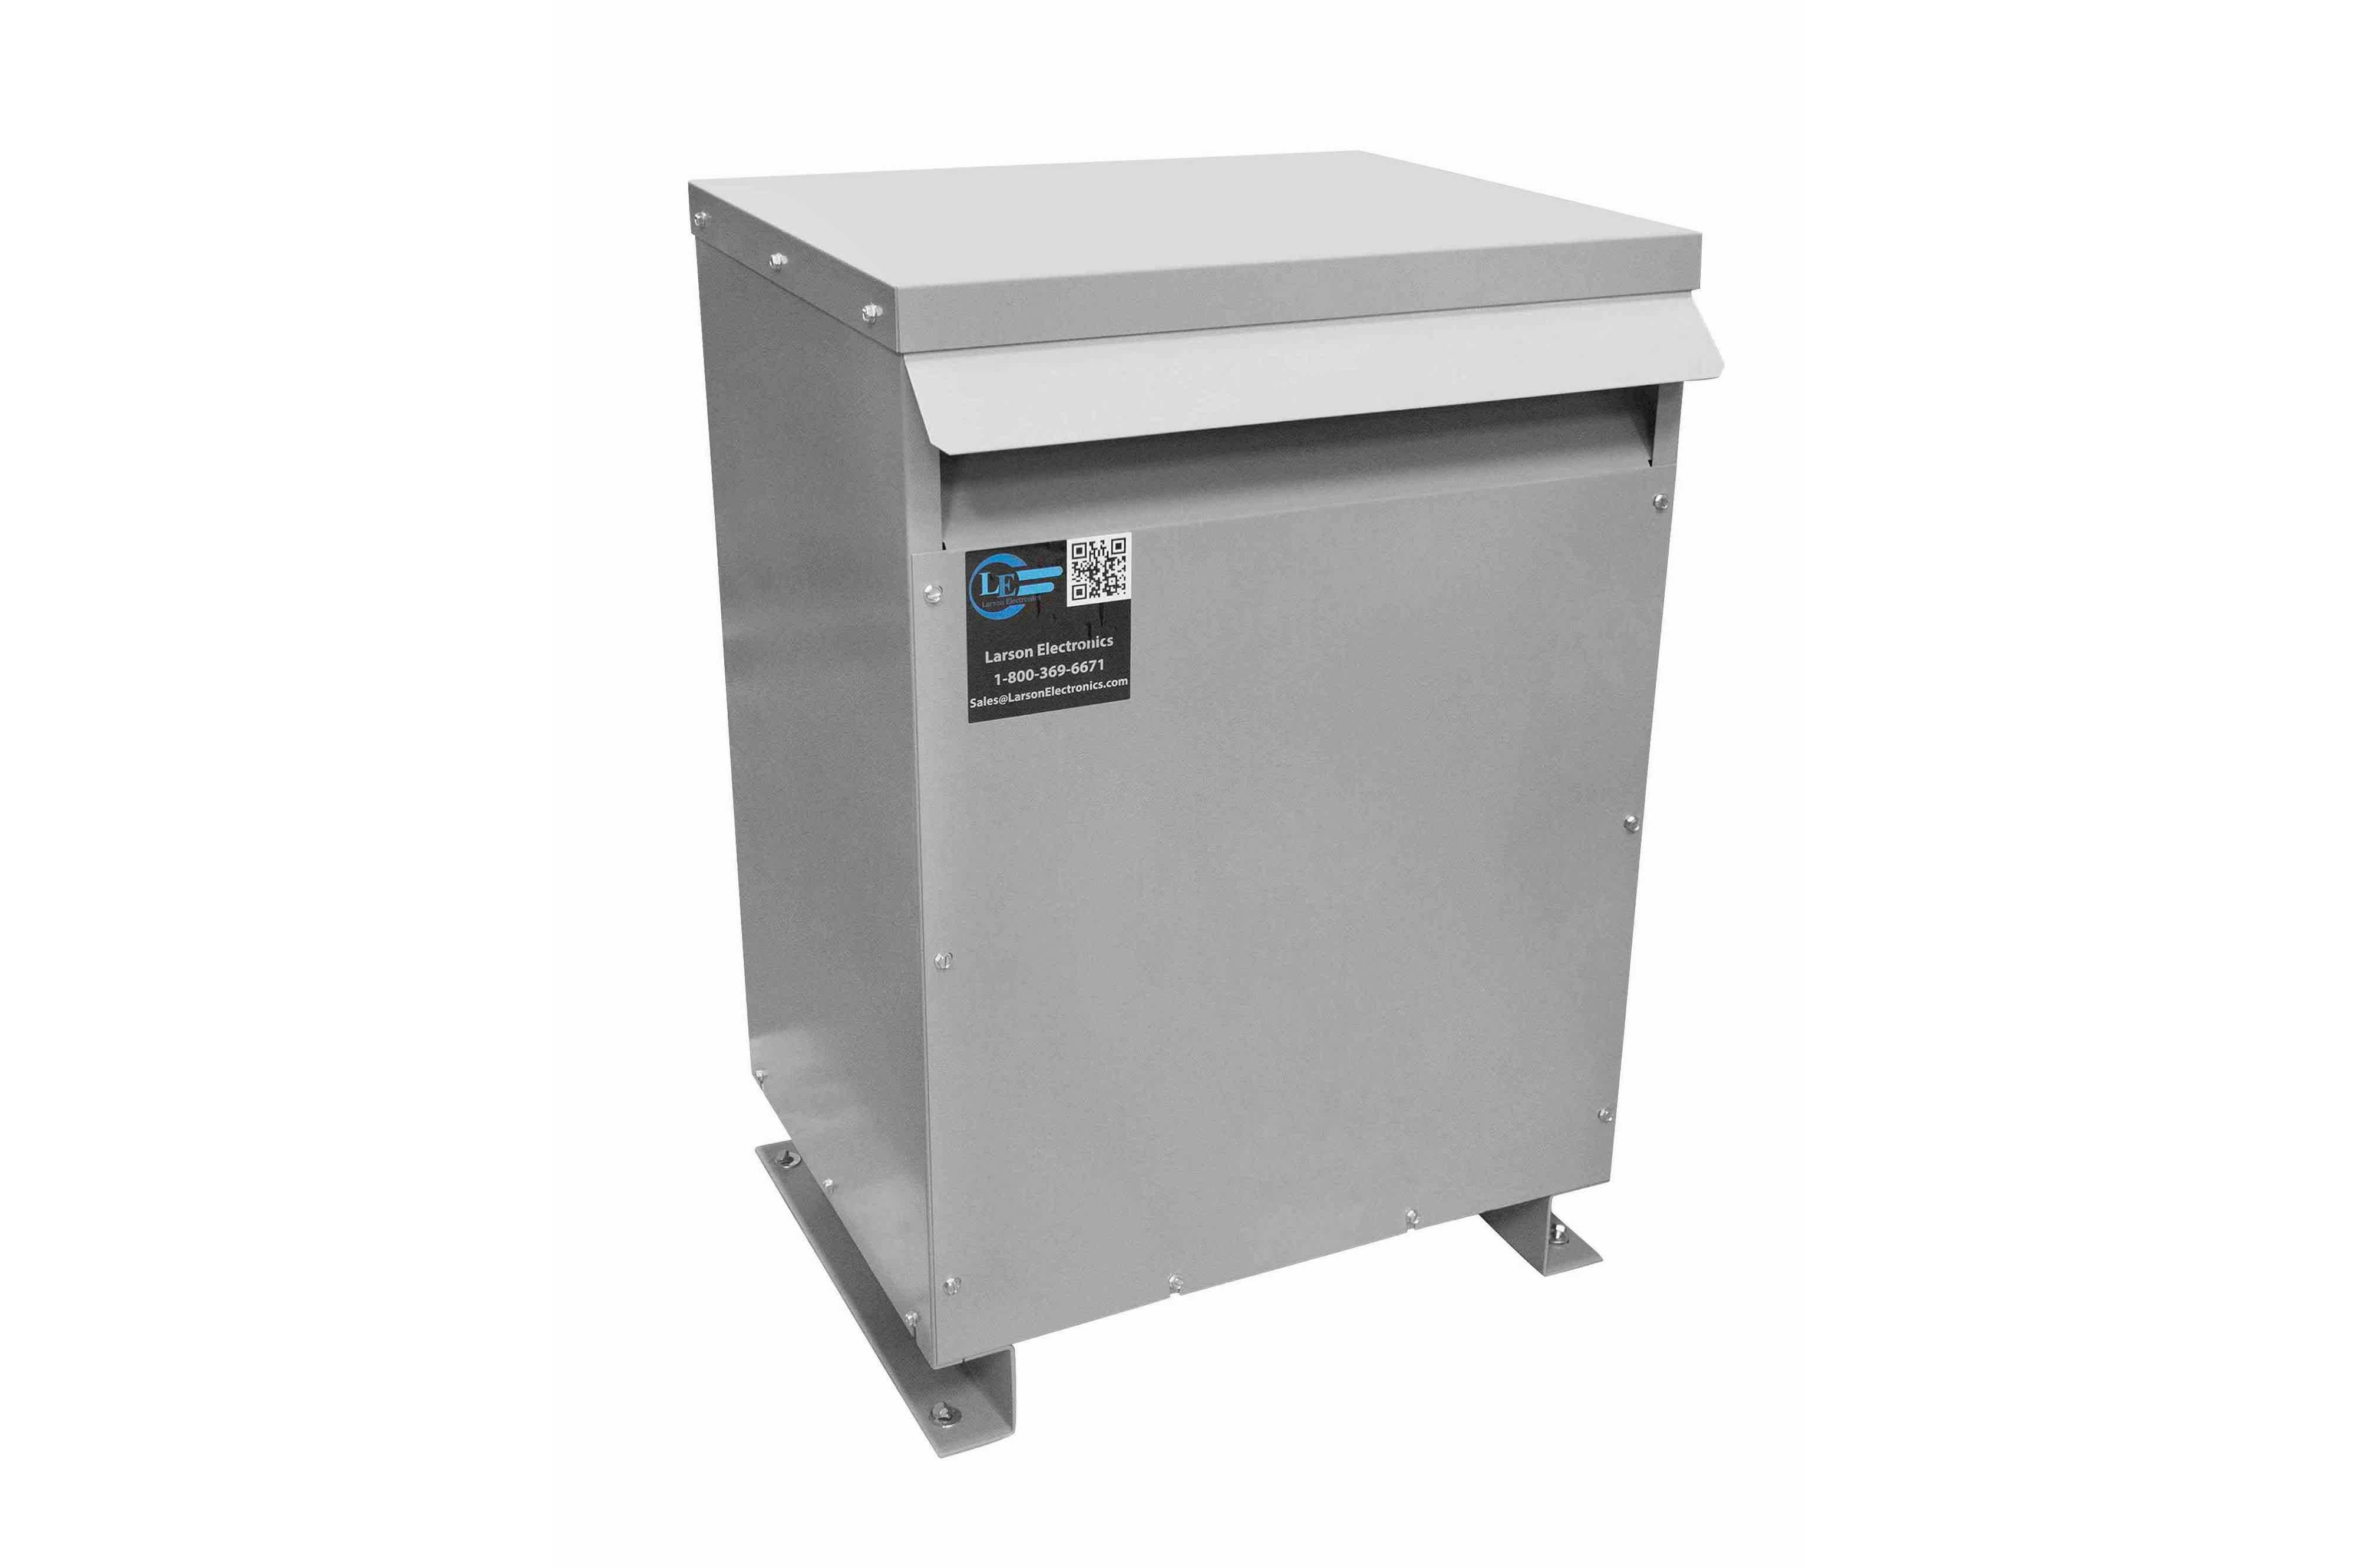 50 kVA 3PH DOE Transformer, 220V Delta Primary, 480Y/277 Wye-N Secondary, N3R, Ventilated, 60 Hz